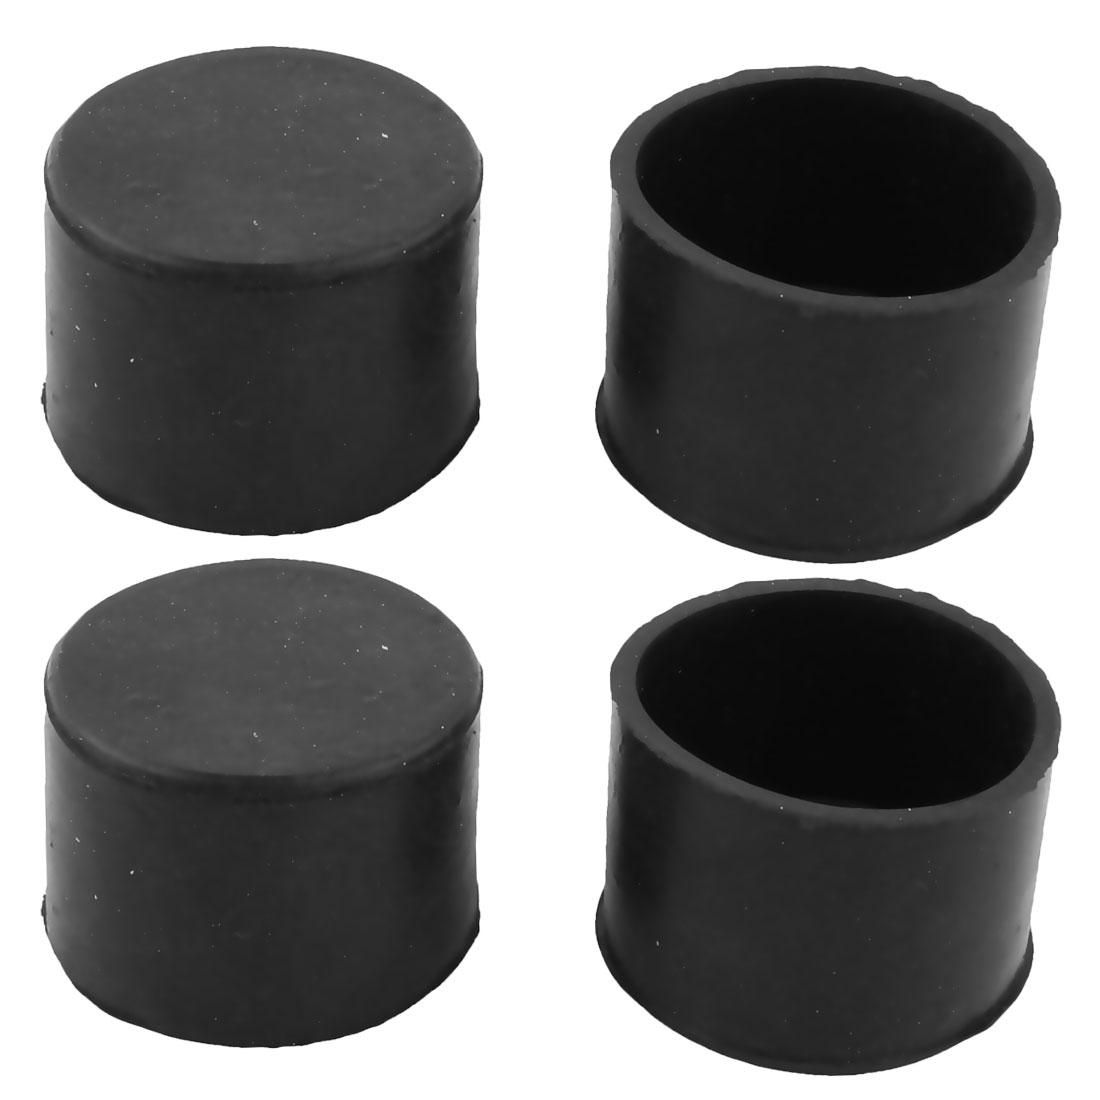 Home Rubber Round Design Furniture Cupboard Sofa Leg Protector Cover Cap 4 Pcs